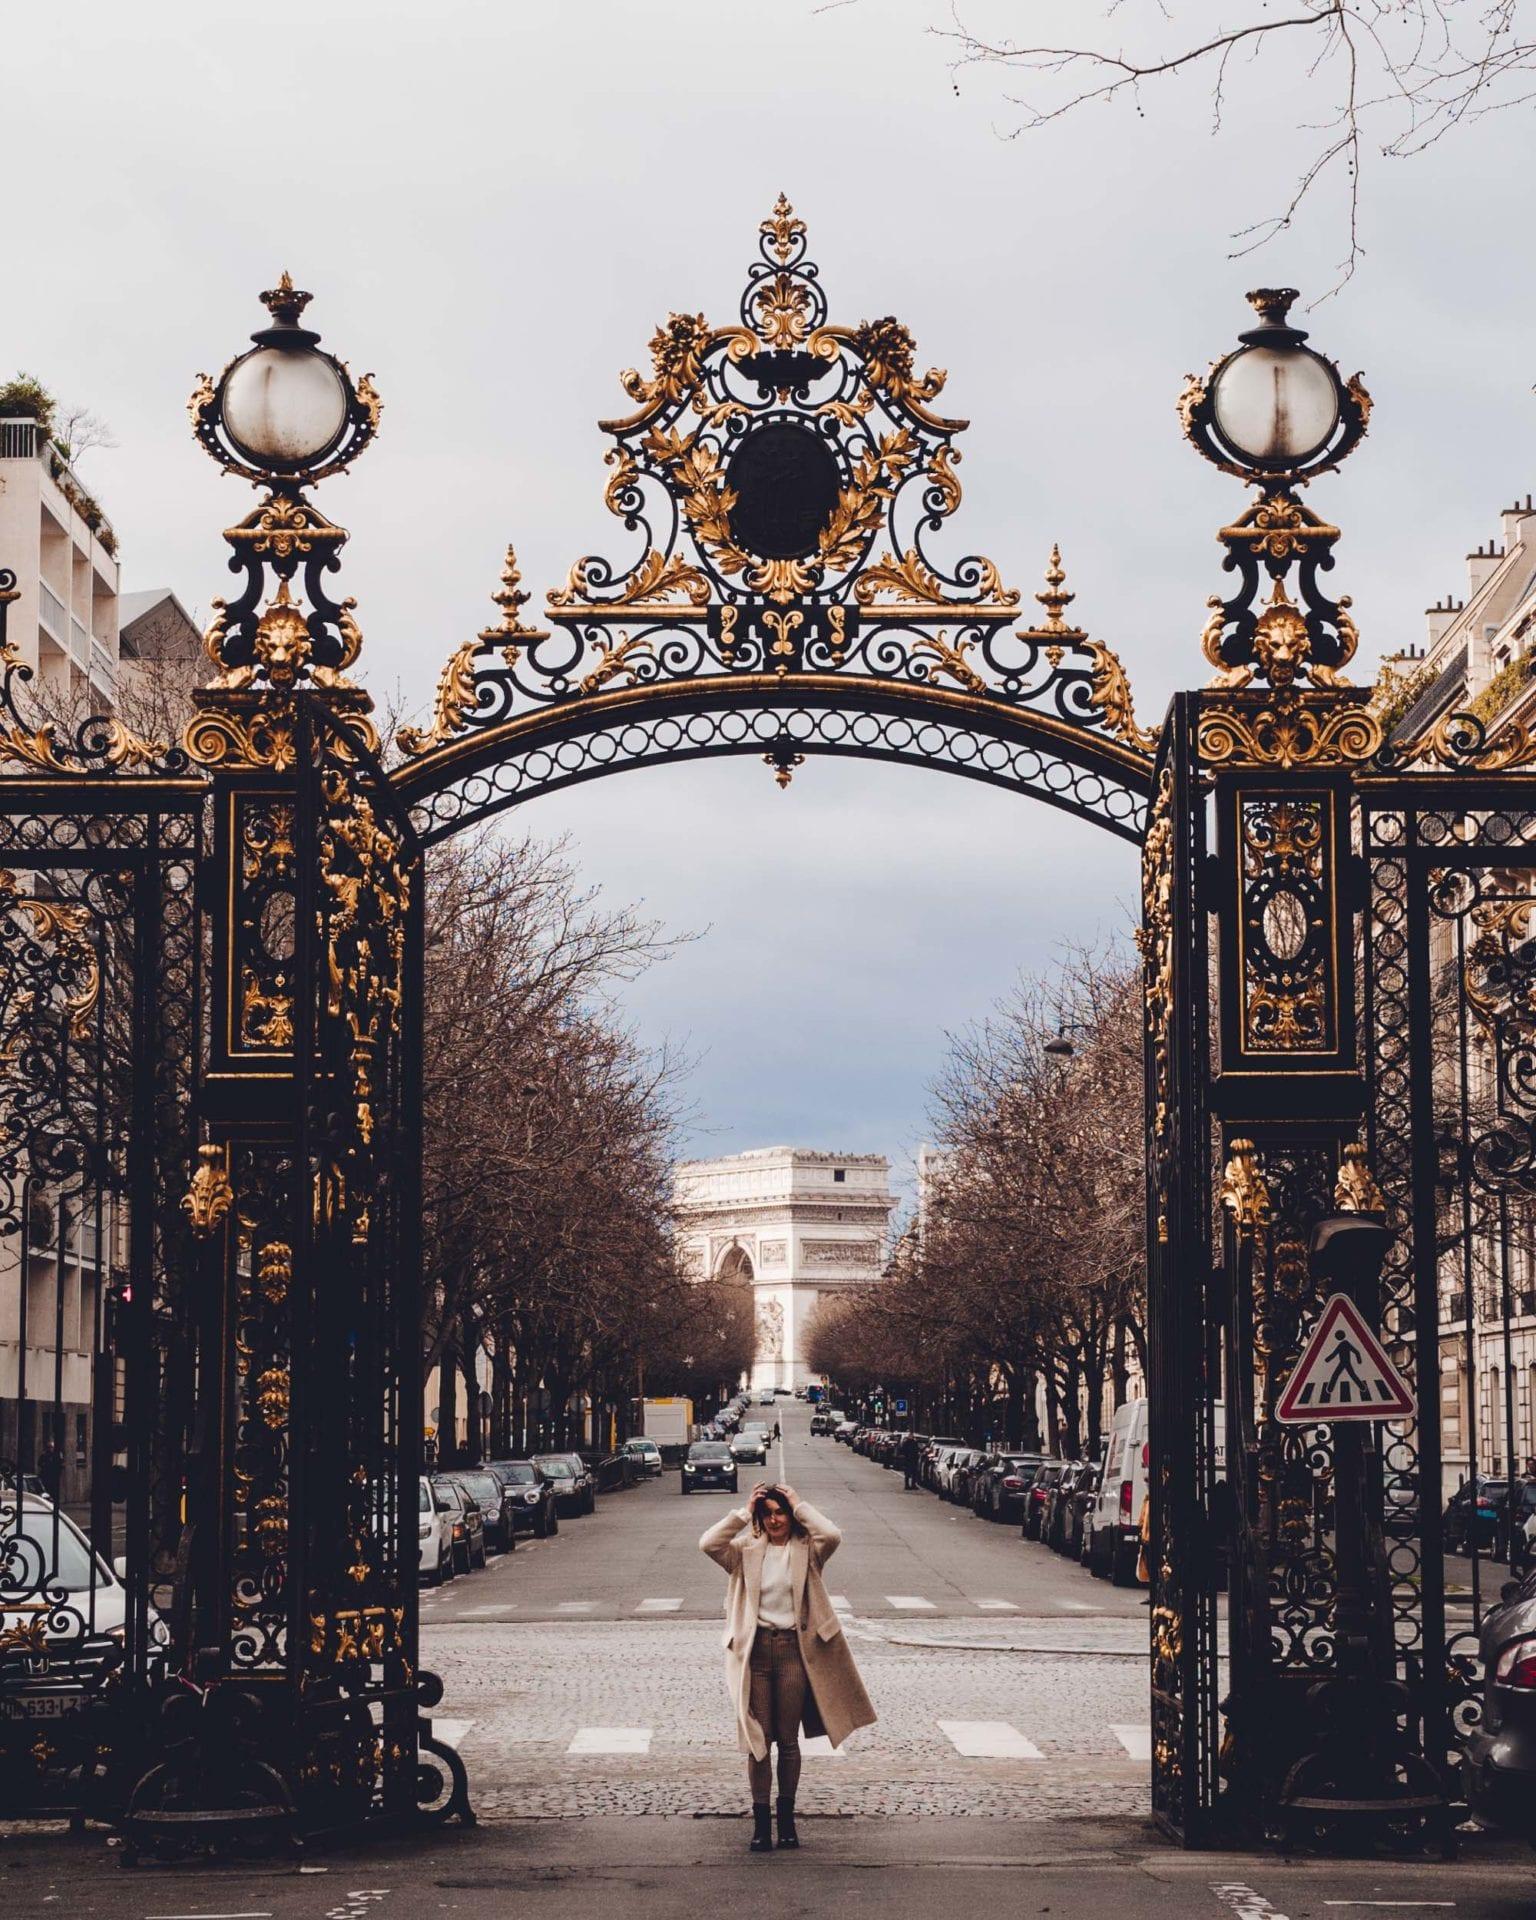 View of the Arc De Triomphe in Paris